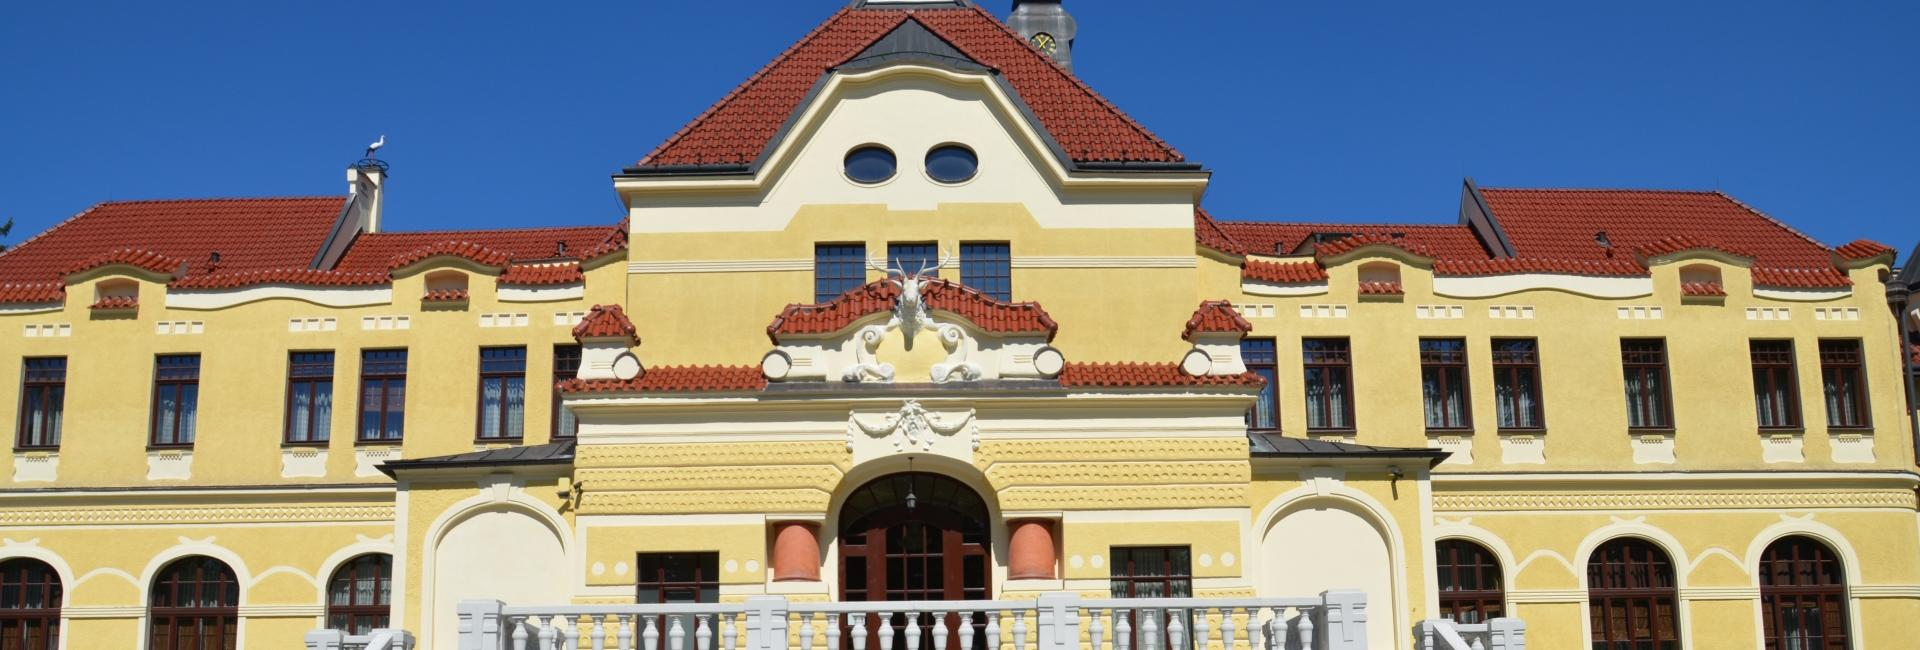 Hotel Rübezahl Marienbad